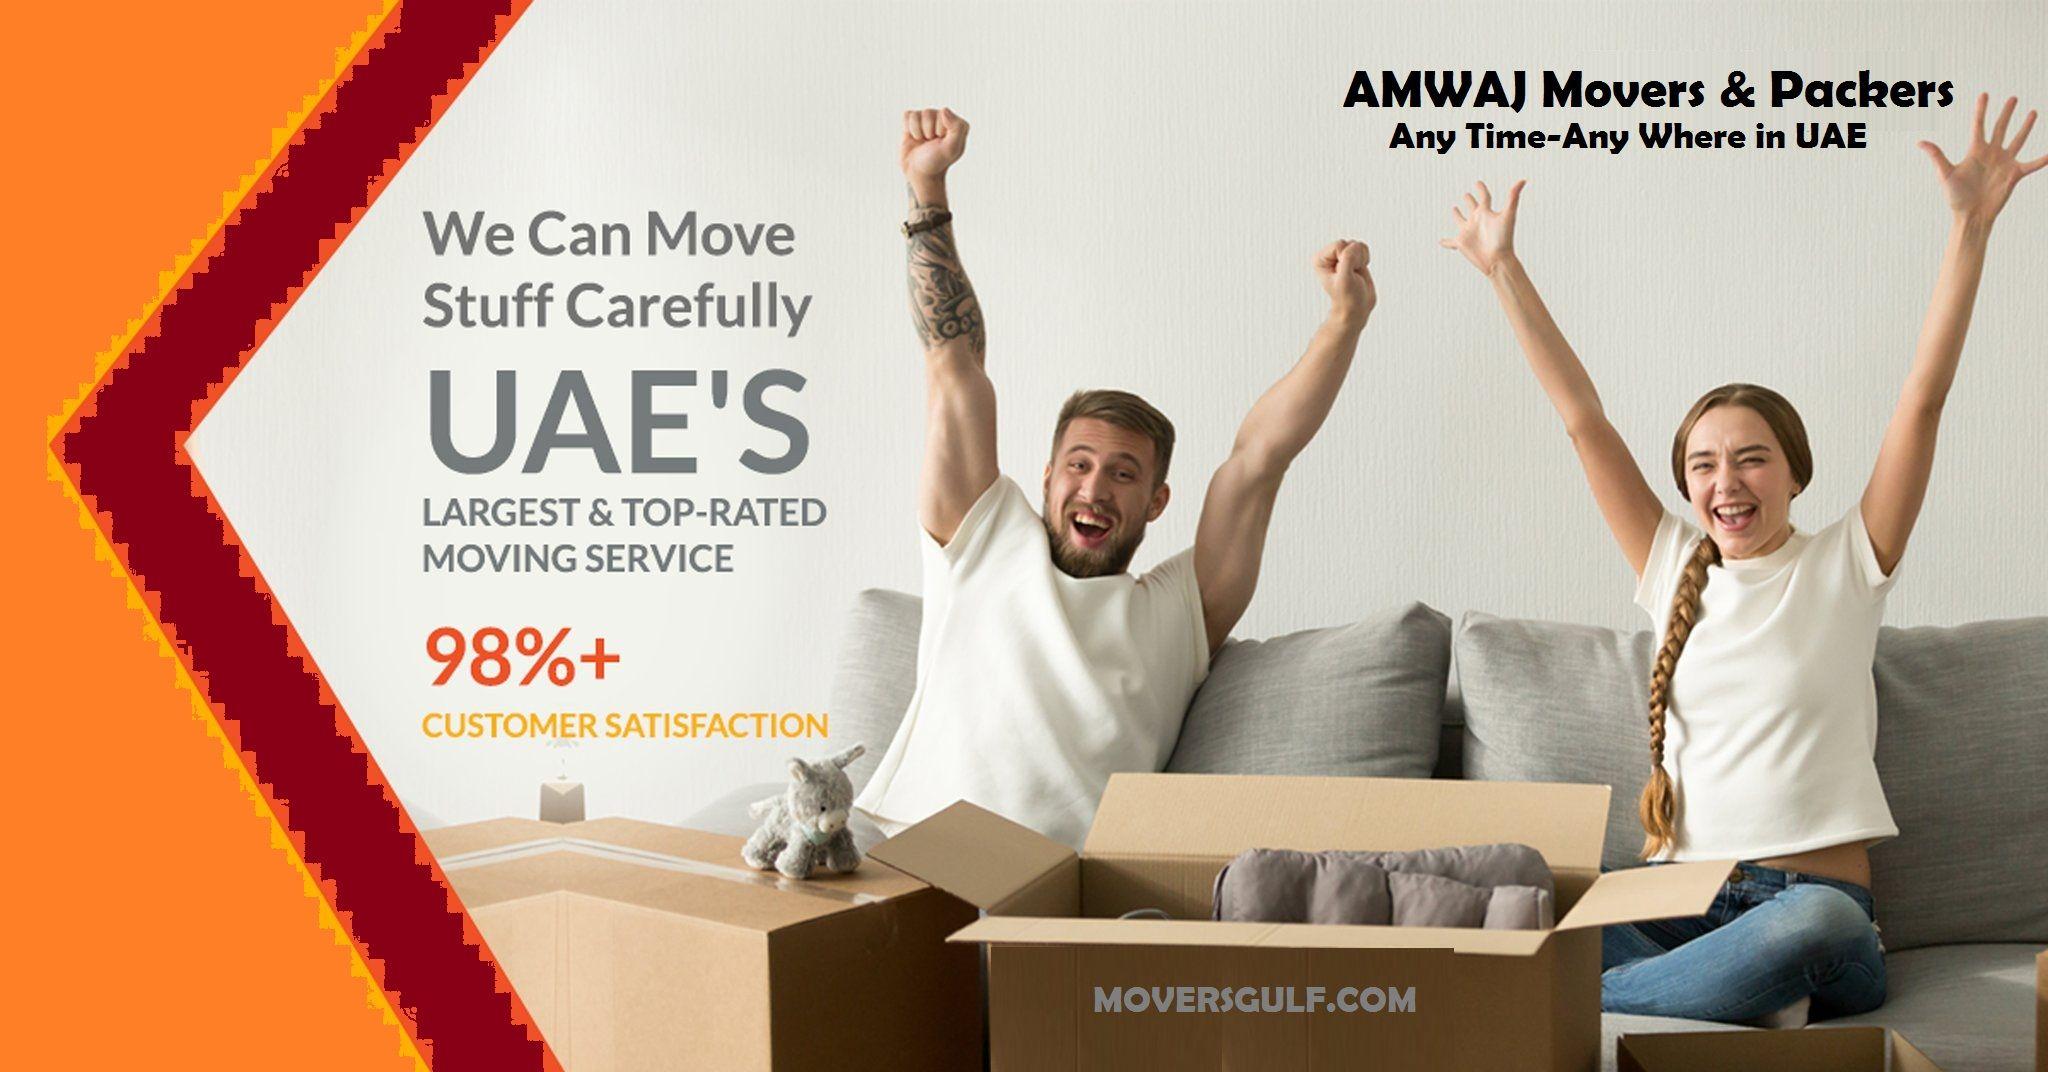 Moving help customer service